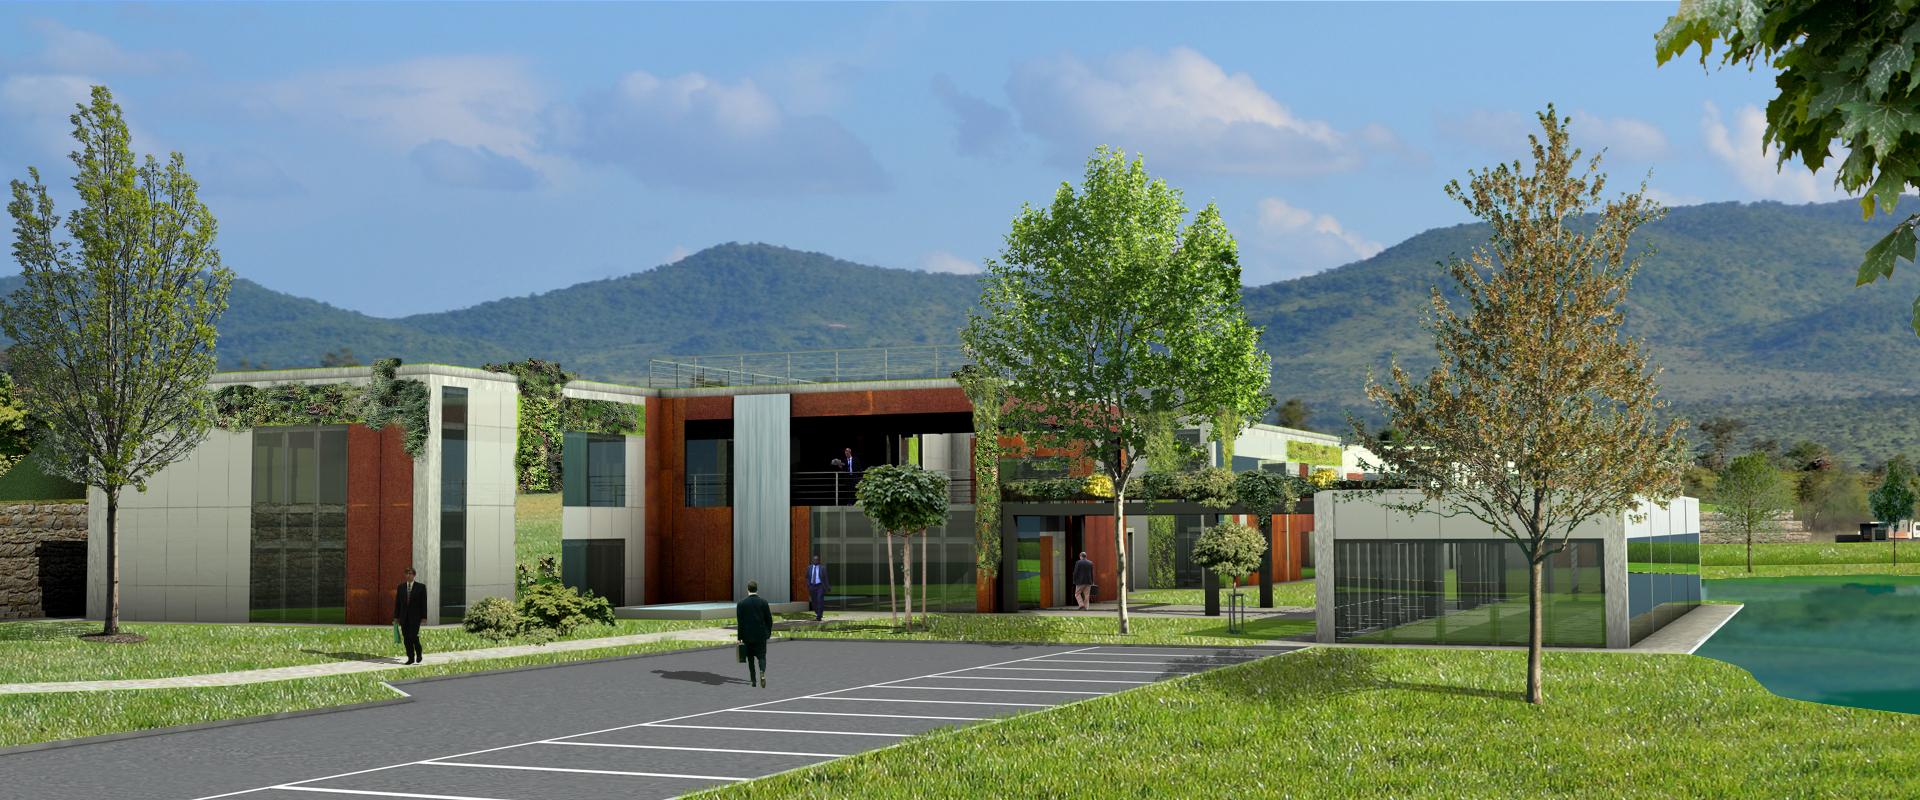 aironic_architettura_design_interior_ewater_factory_rendering